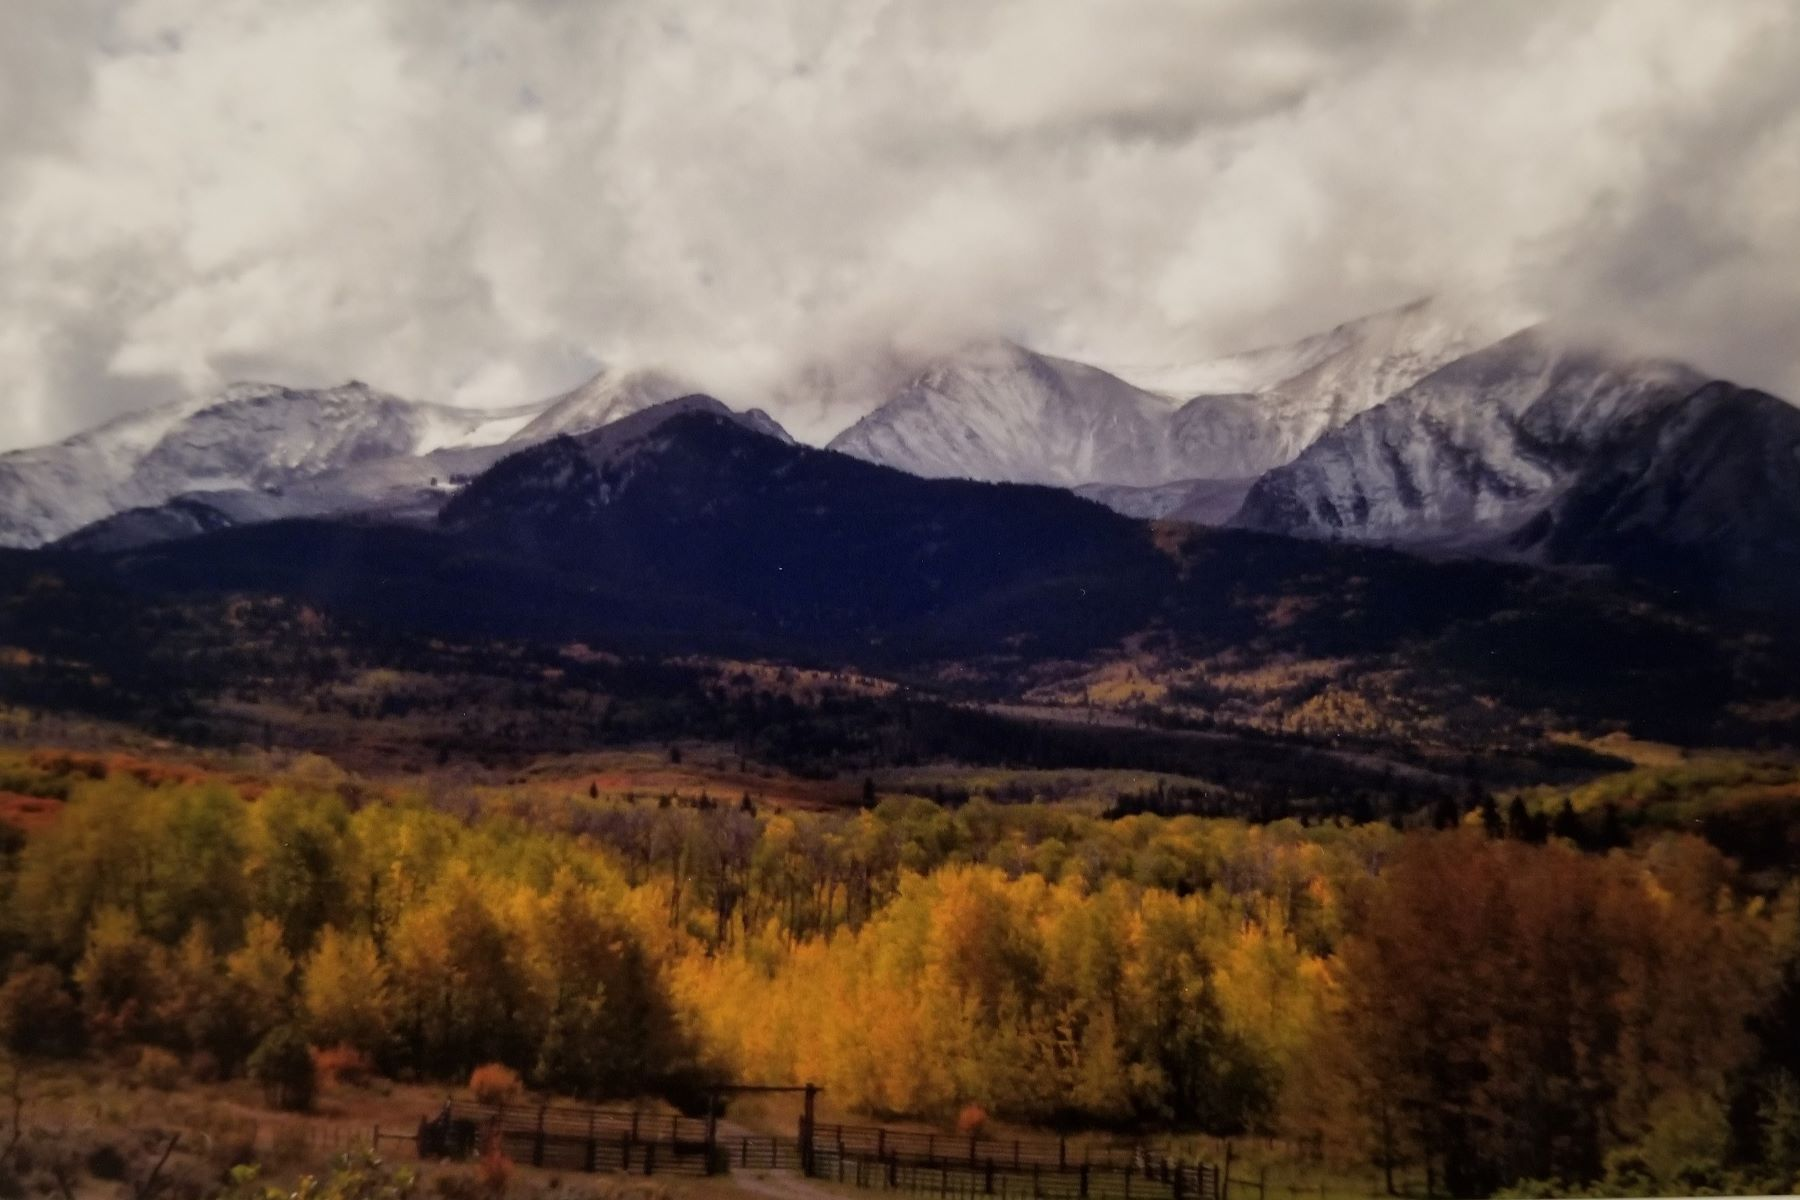 Land for Sale at Coryell Ranch, Homesite 17 0436 Coryell Ranch Road Carbondale, Colorado 81623 United States